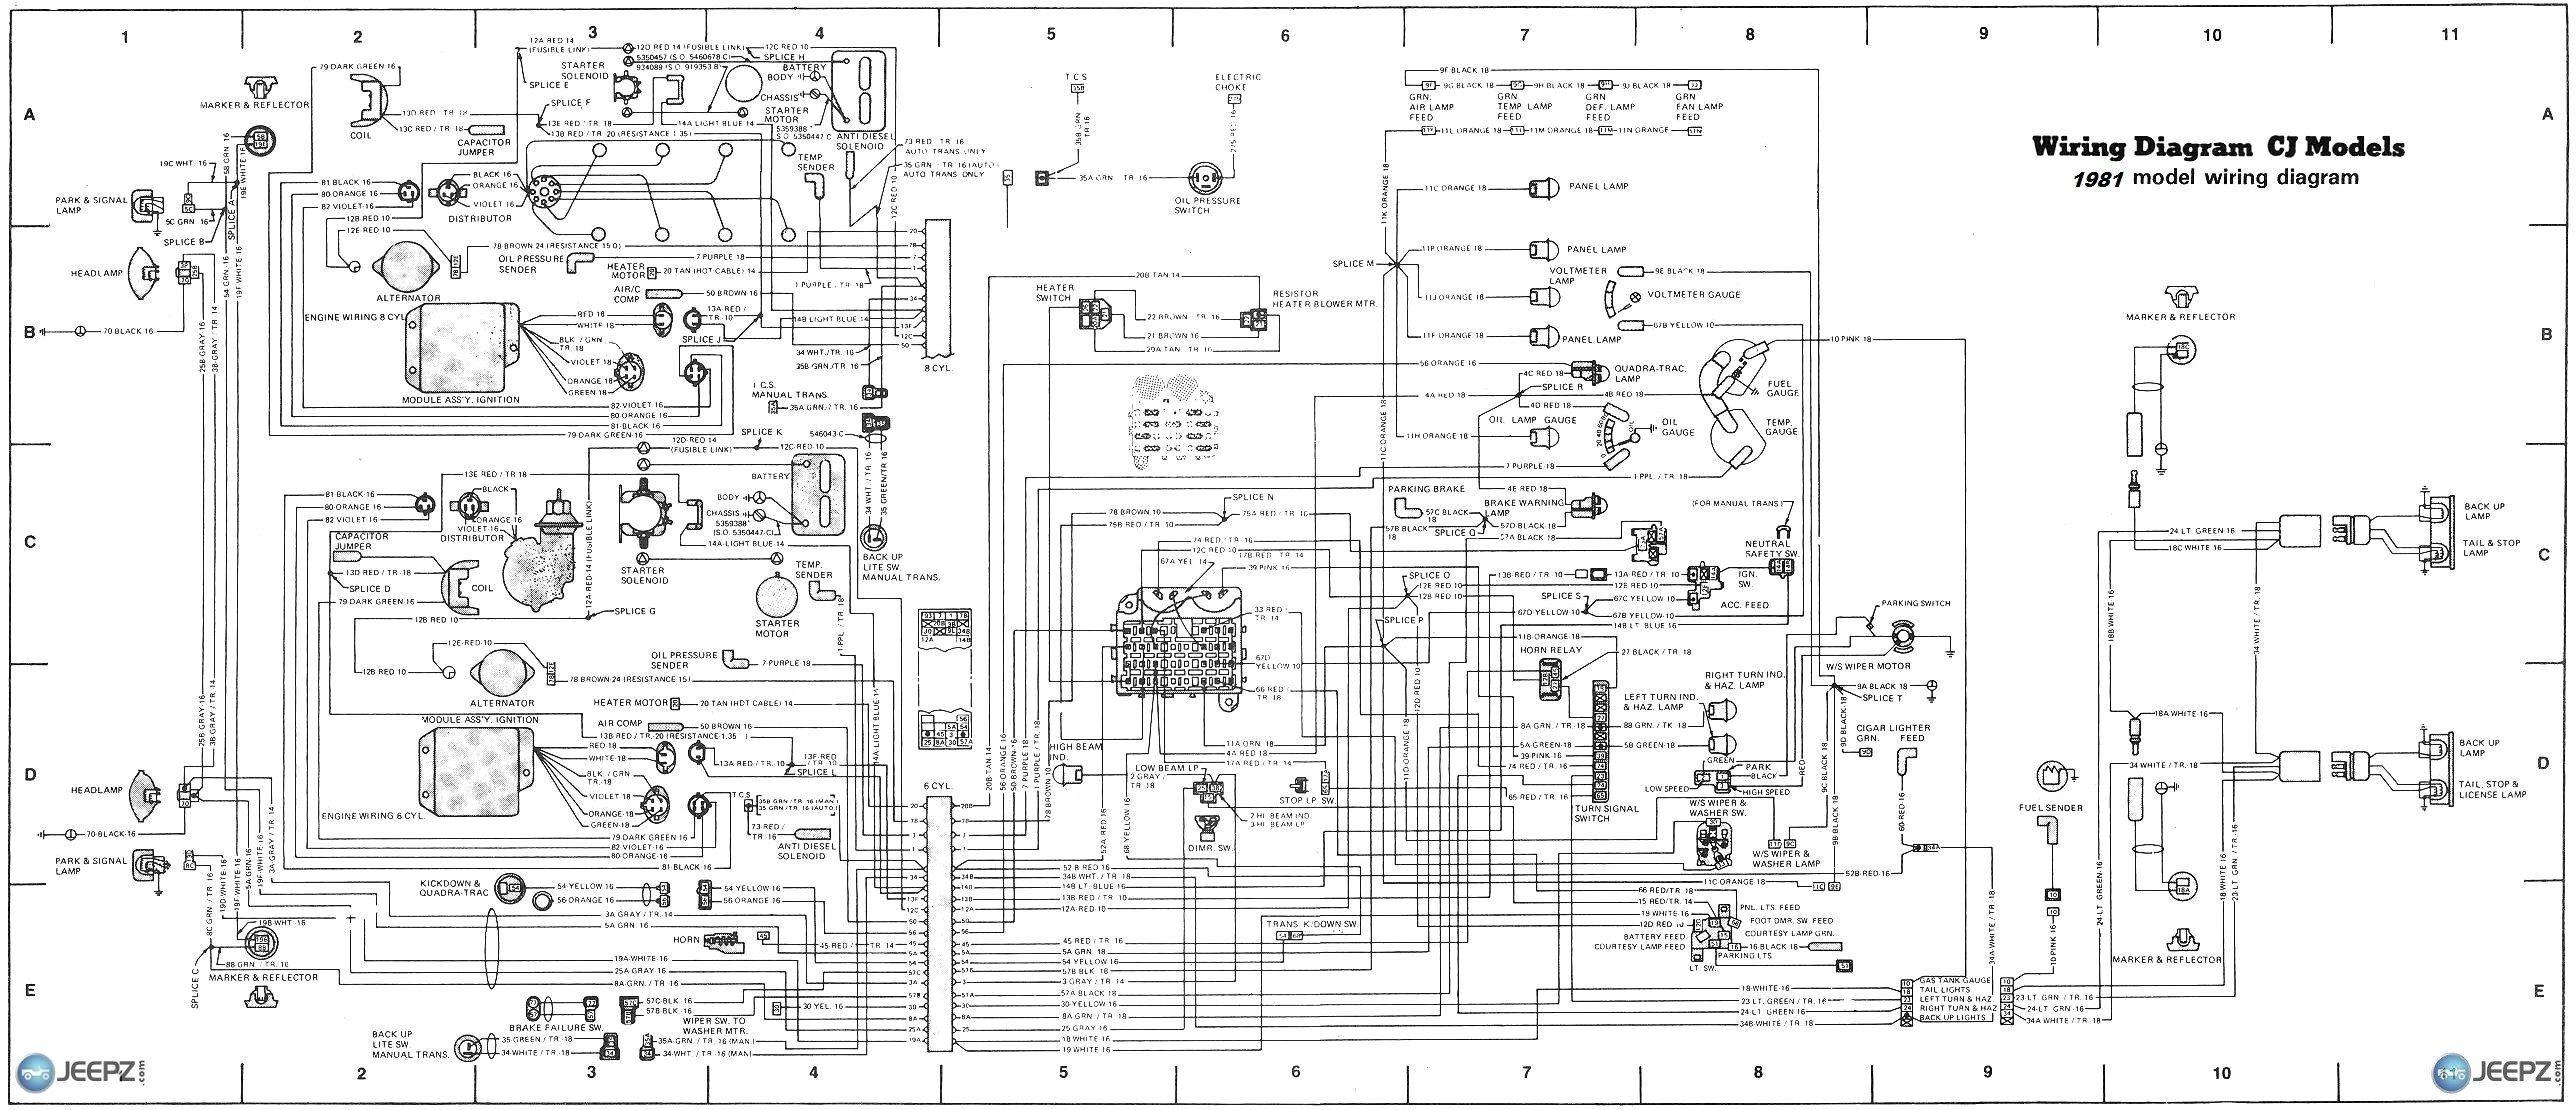 hight resolution of 1979 jeep j10 wiring diagram 2 sg dbd de u202271 jeep j10 wiring colors wiring